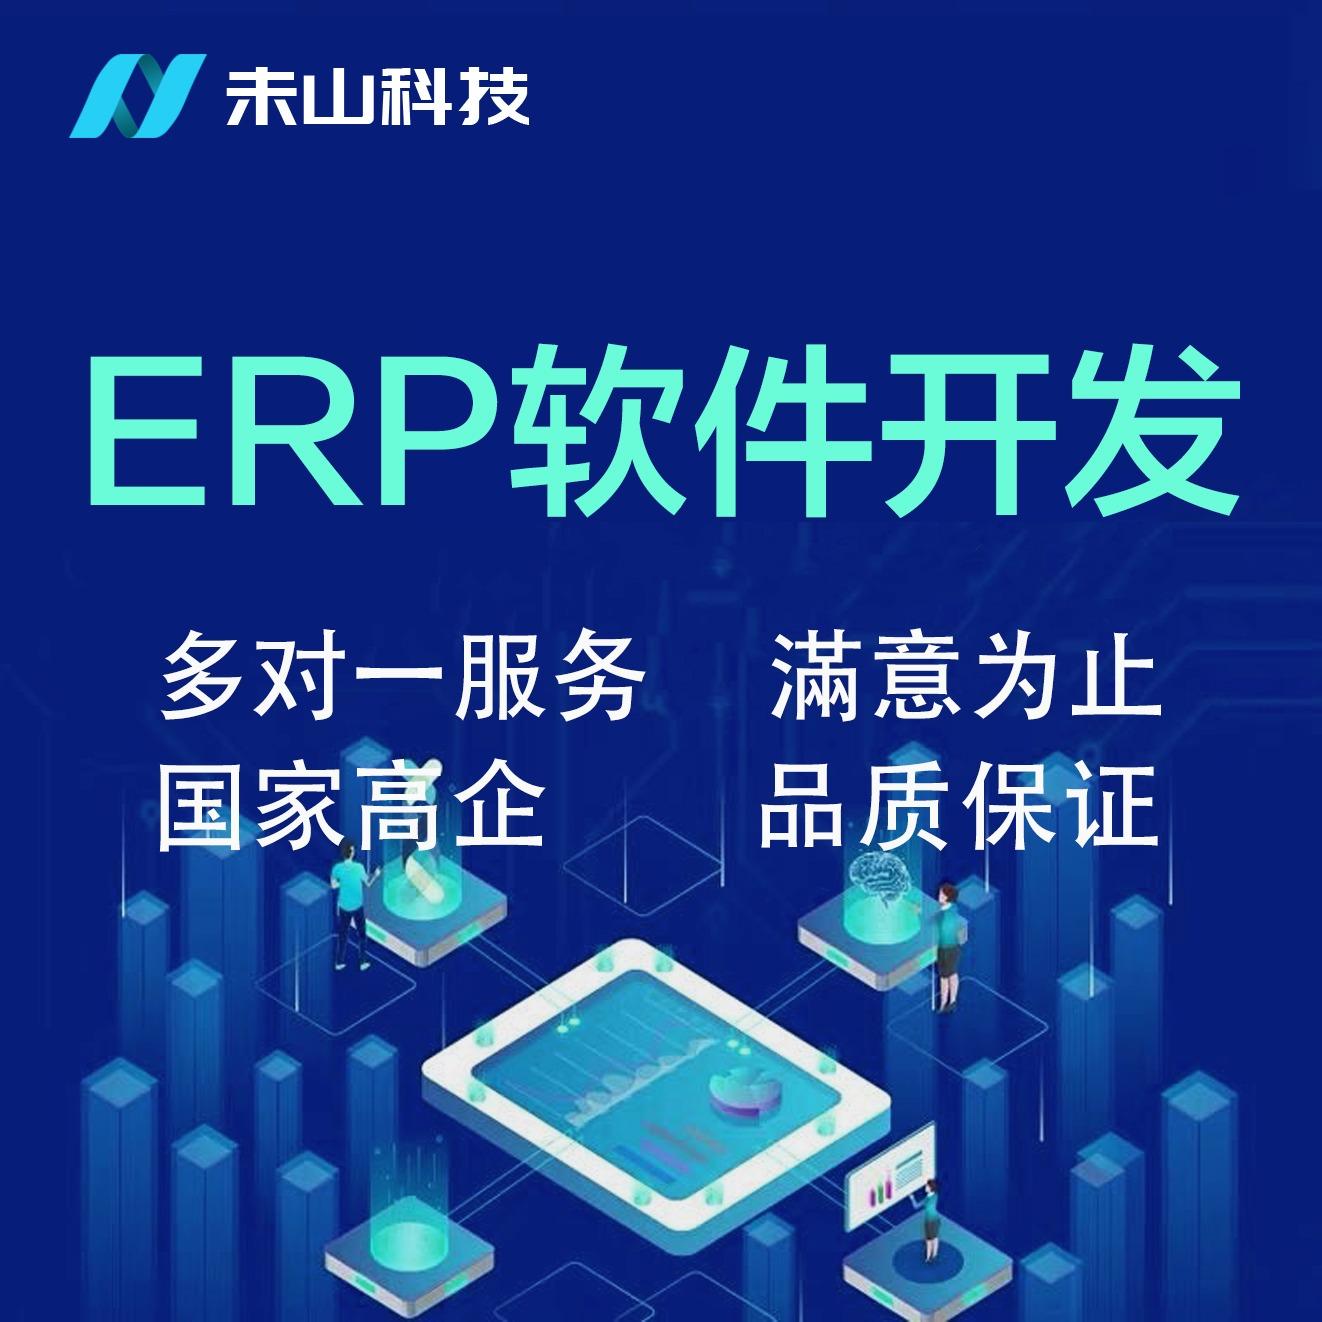 ERP软件/ERP对接/招标投标/南网供应链/金蝶用友二开